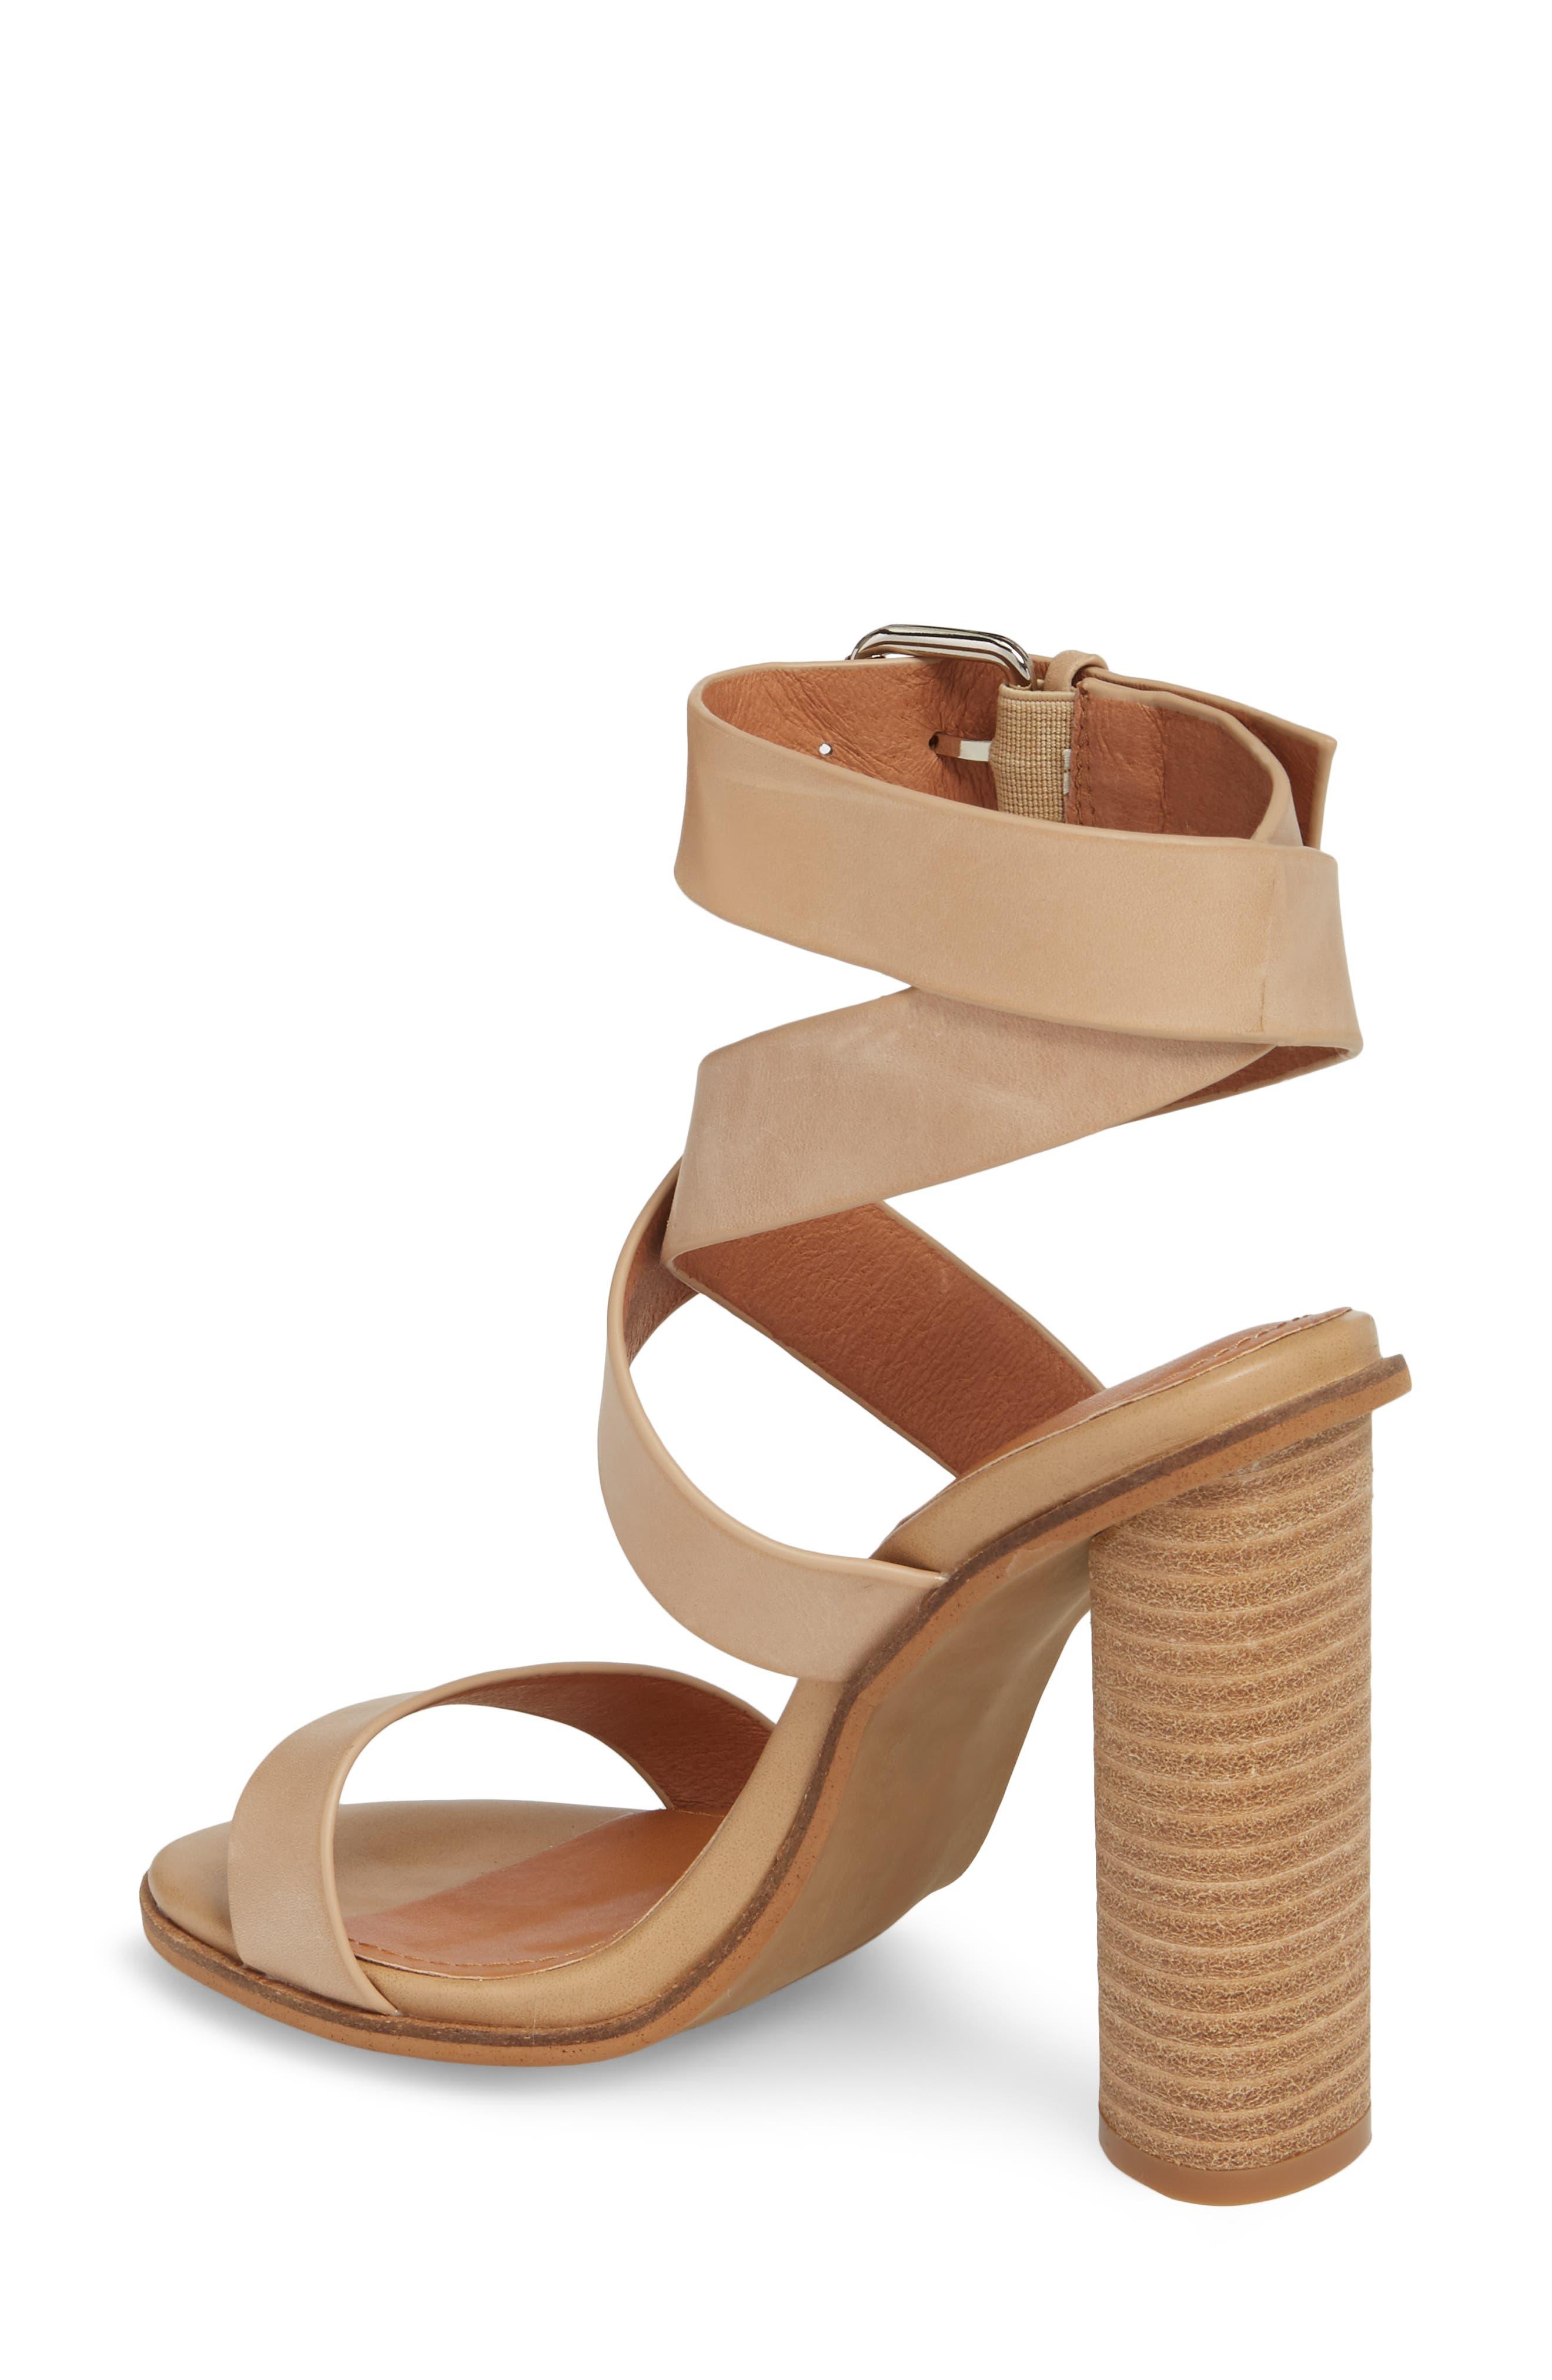 Abaala Cross Strap Sandal,                             Alternate thumbnail 2, color,                             Natural Leather